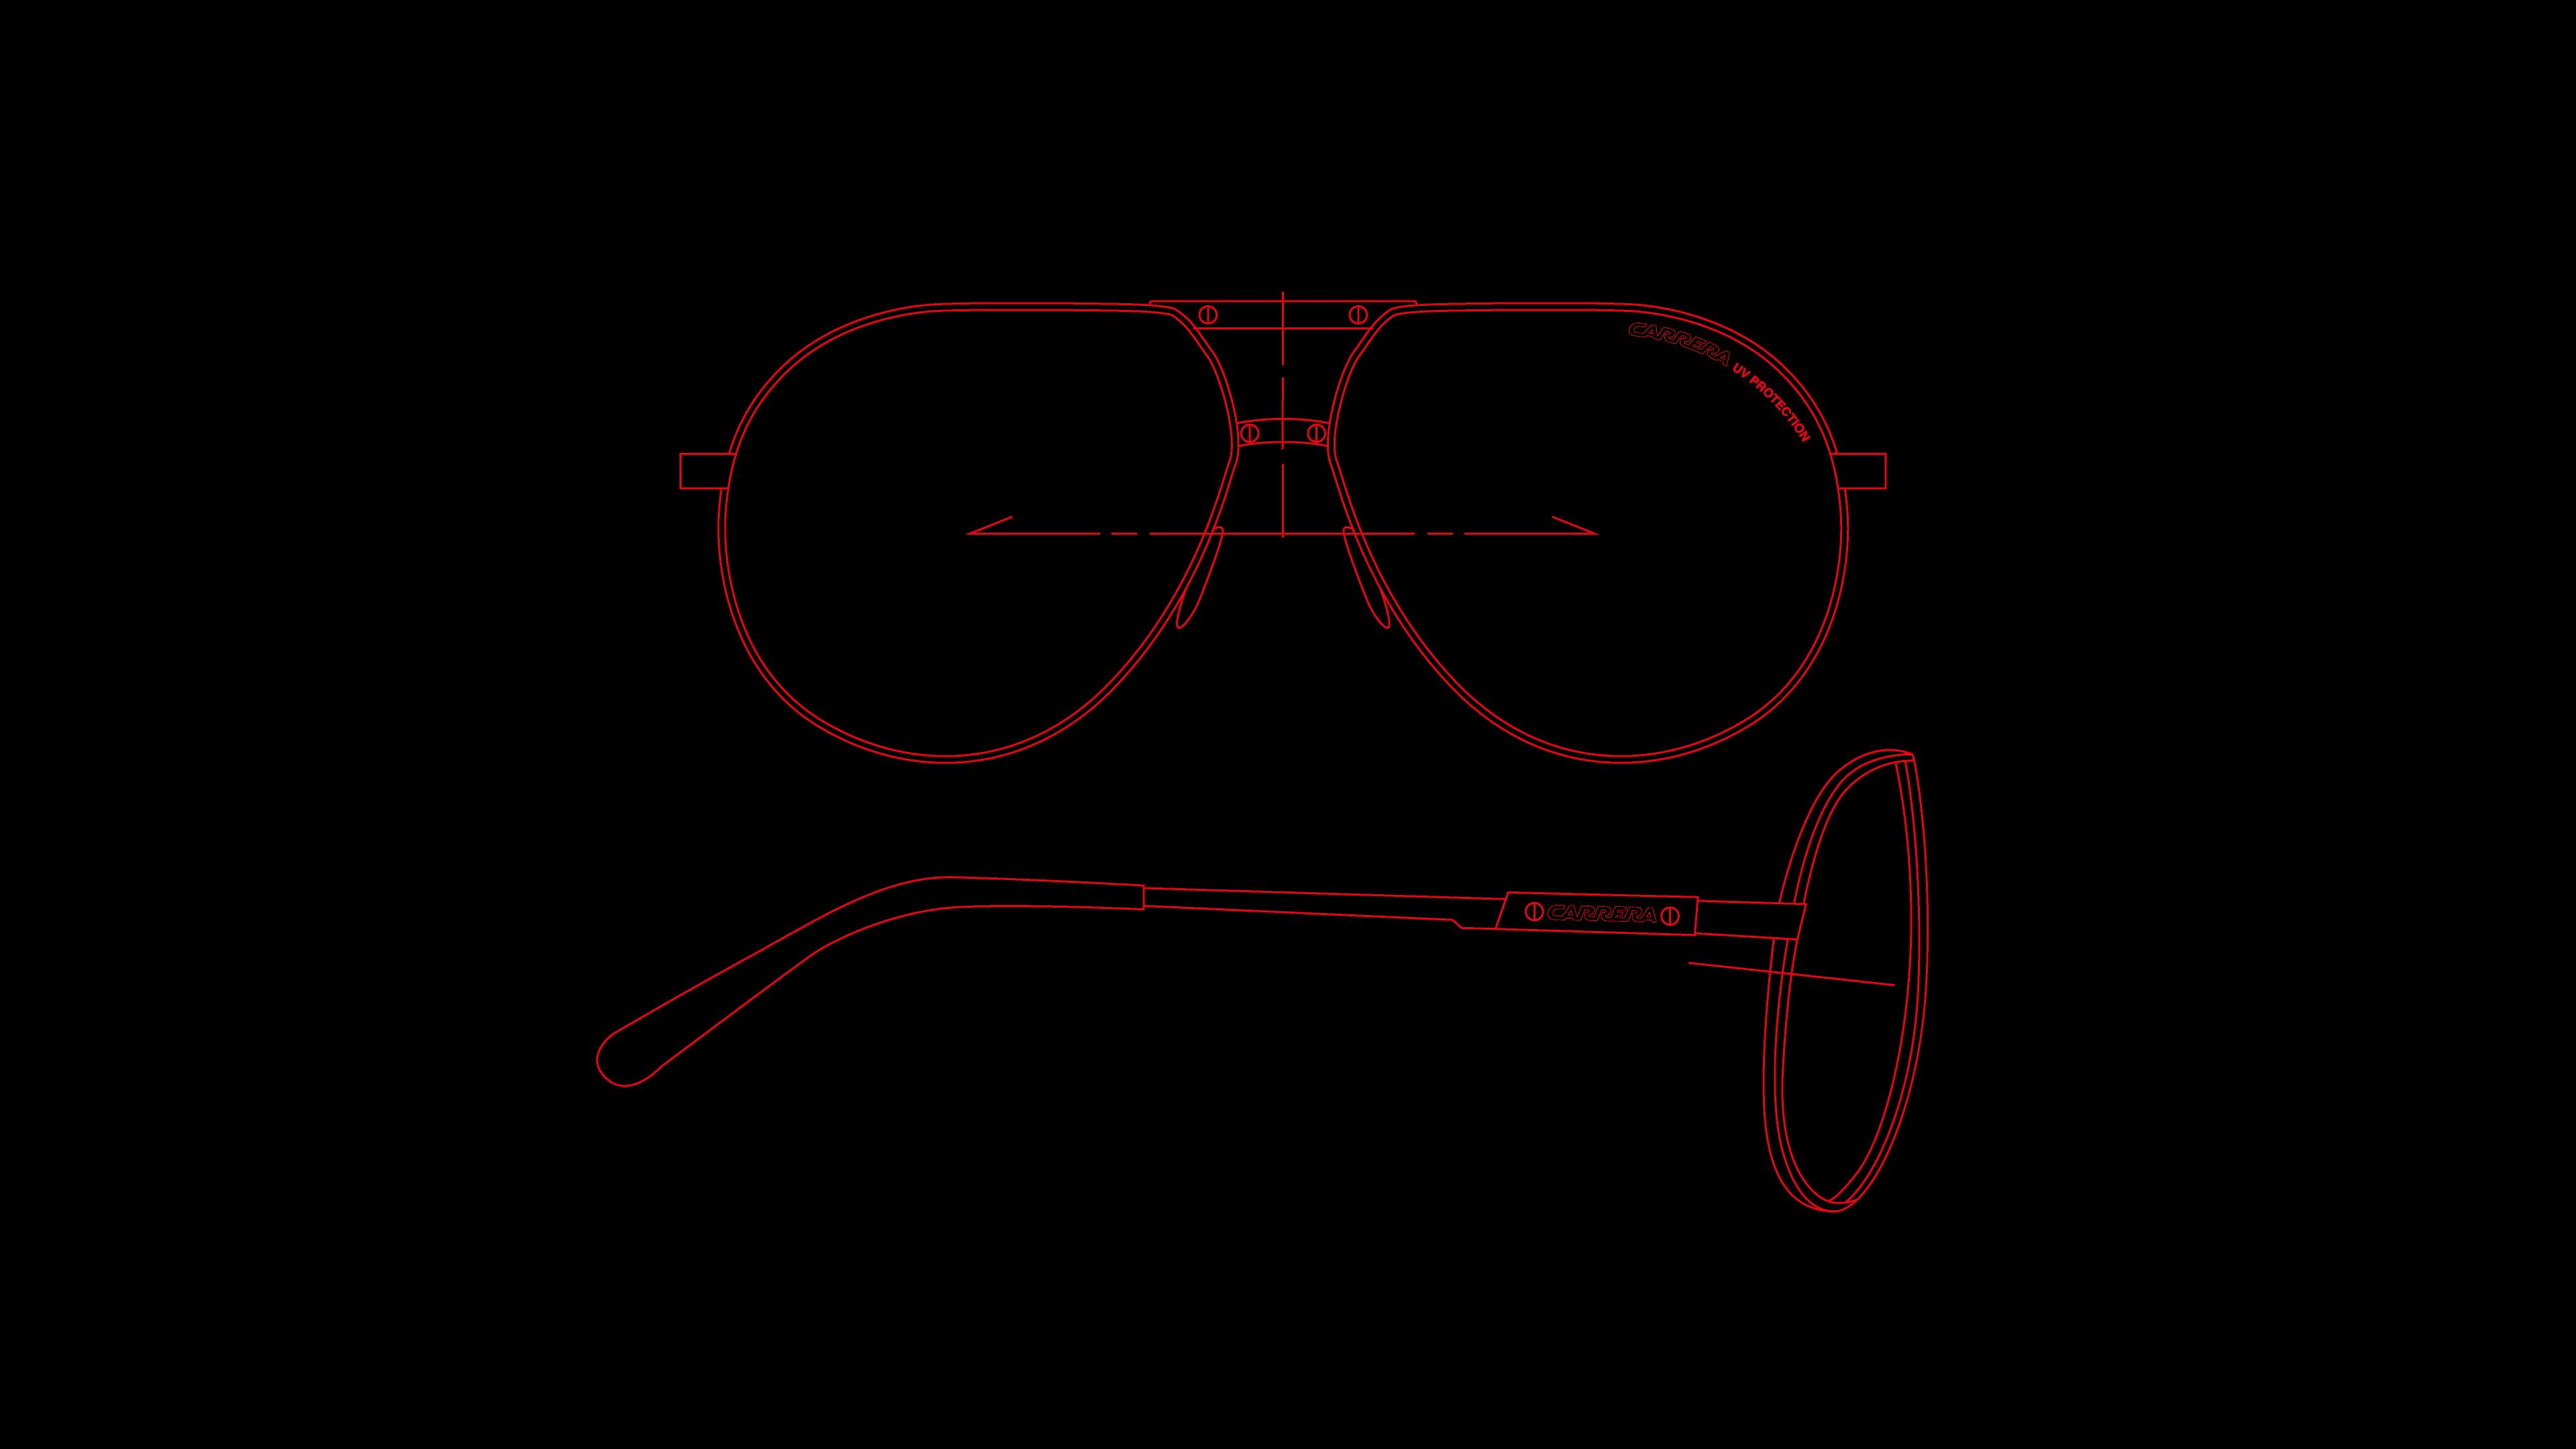 CARRERA-product-schematics-02